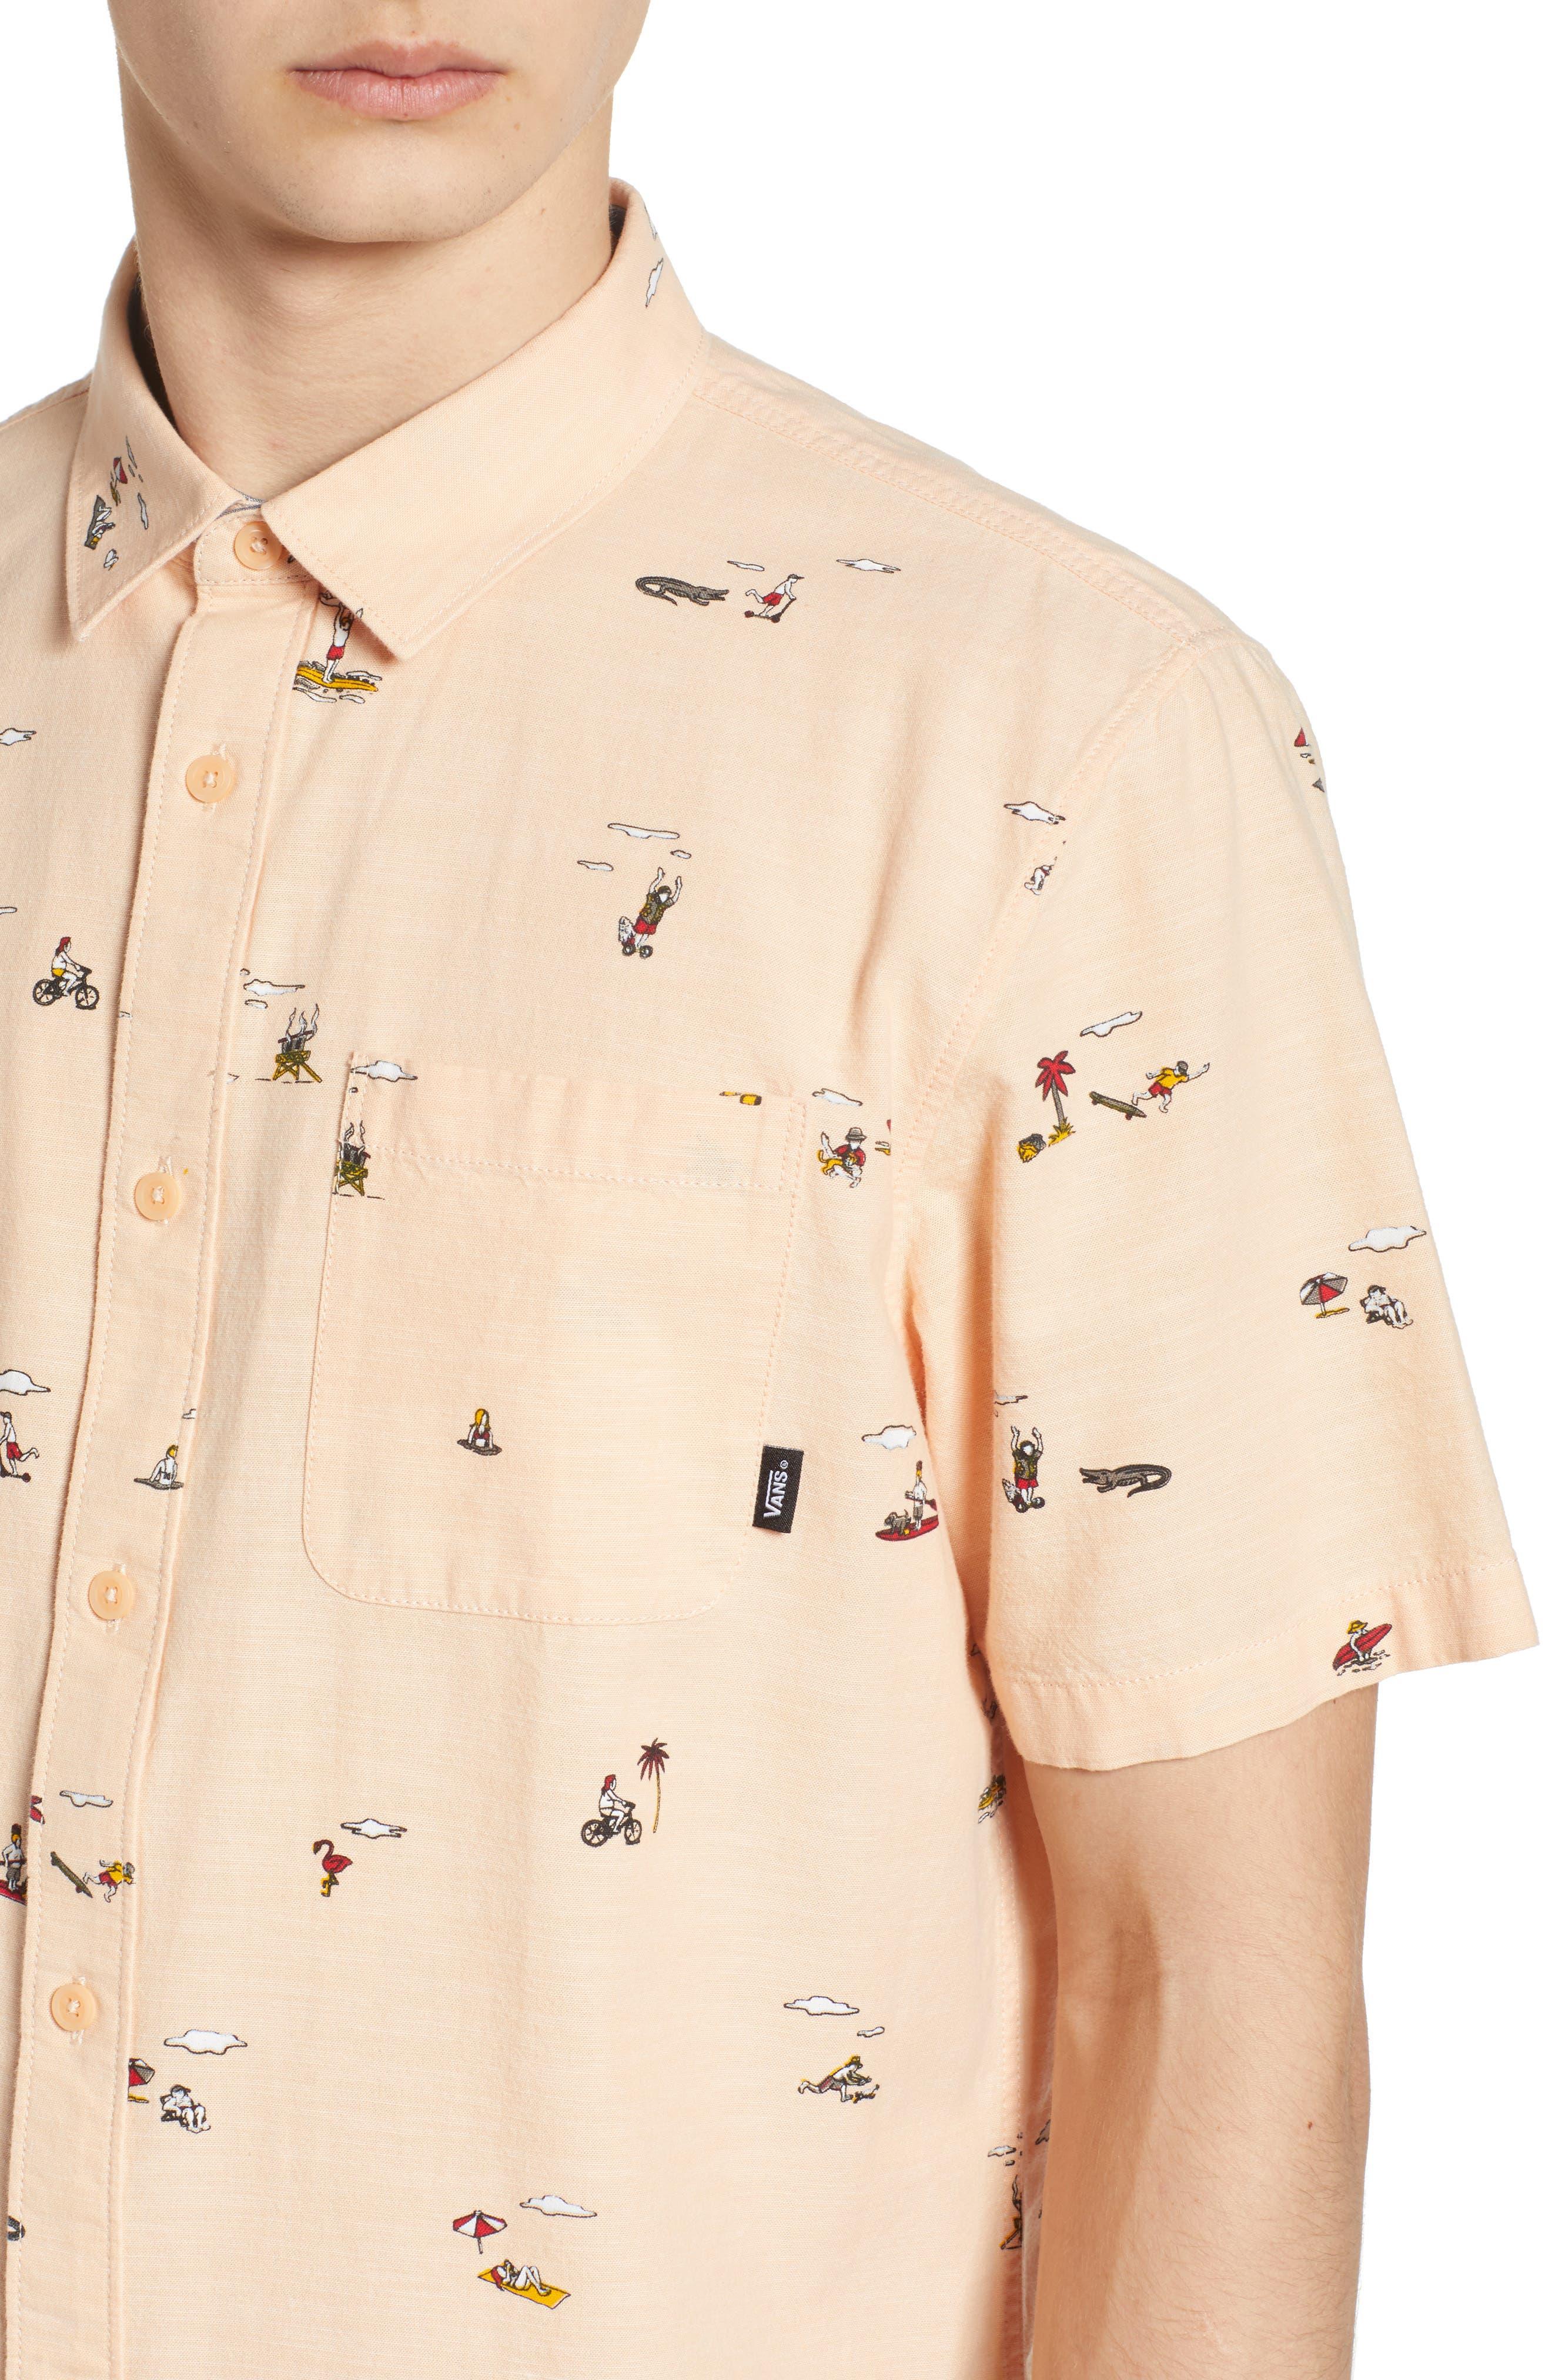 Tres Palmas Short Sleeve Shirt,                             Alternate thumbnail 4, color,                             Apricot Ice